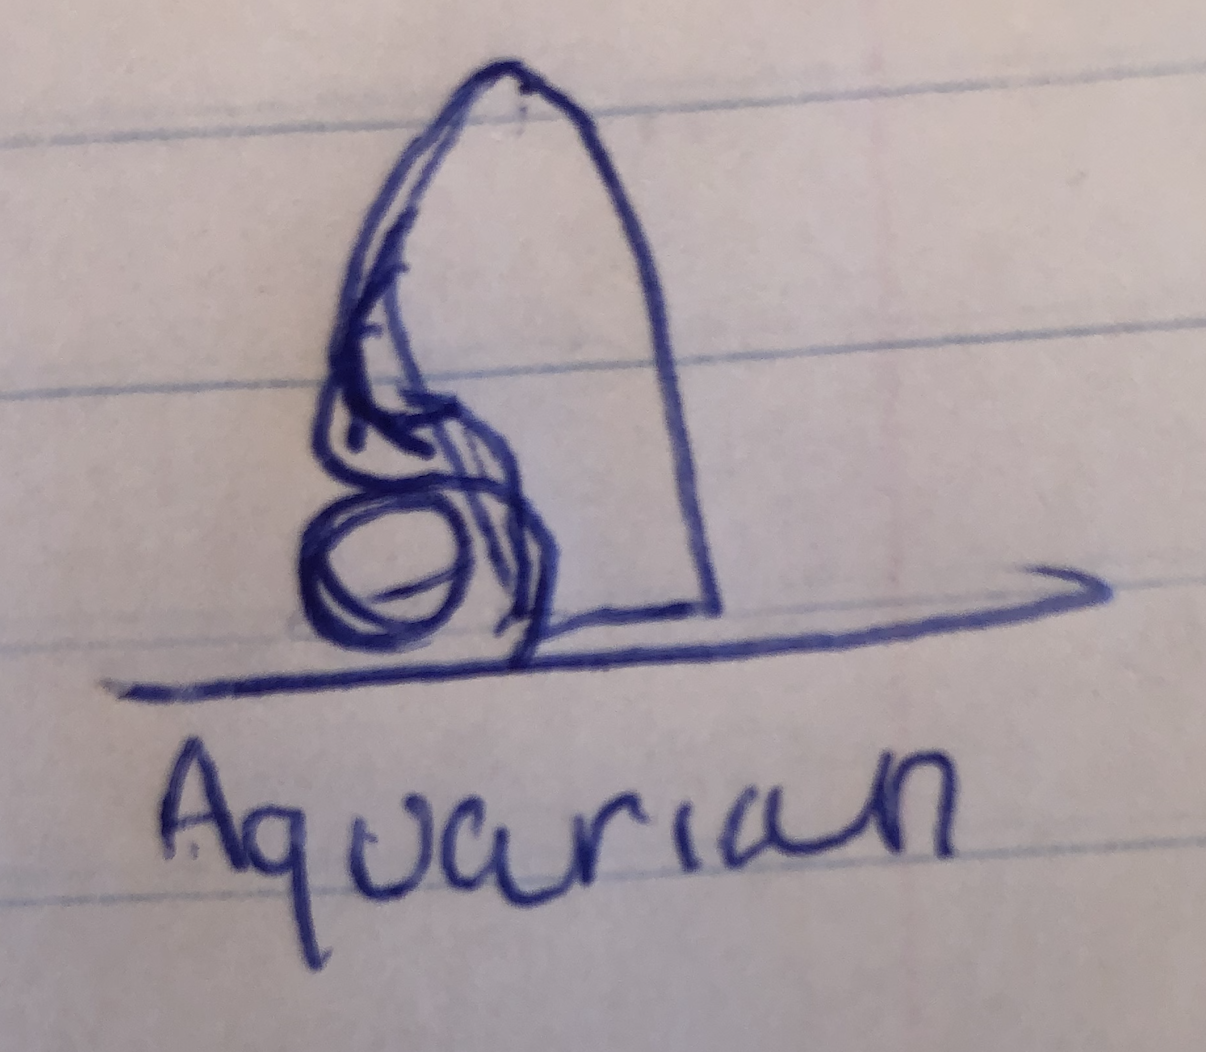 Original hand-design of Aquarian logo on lined paper